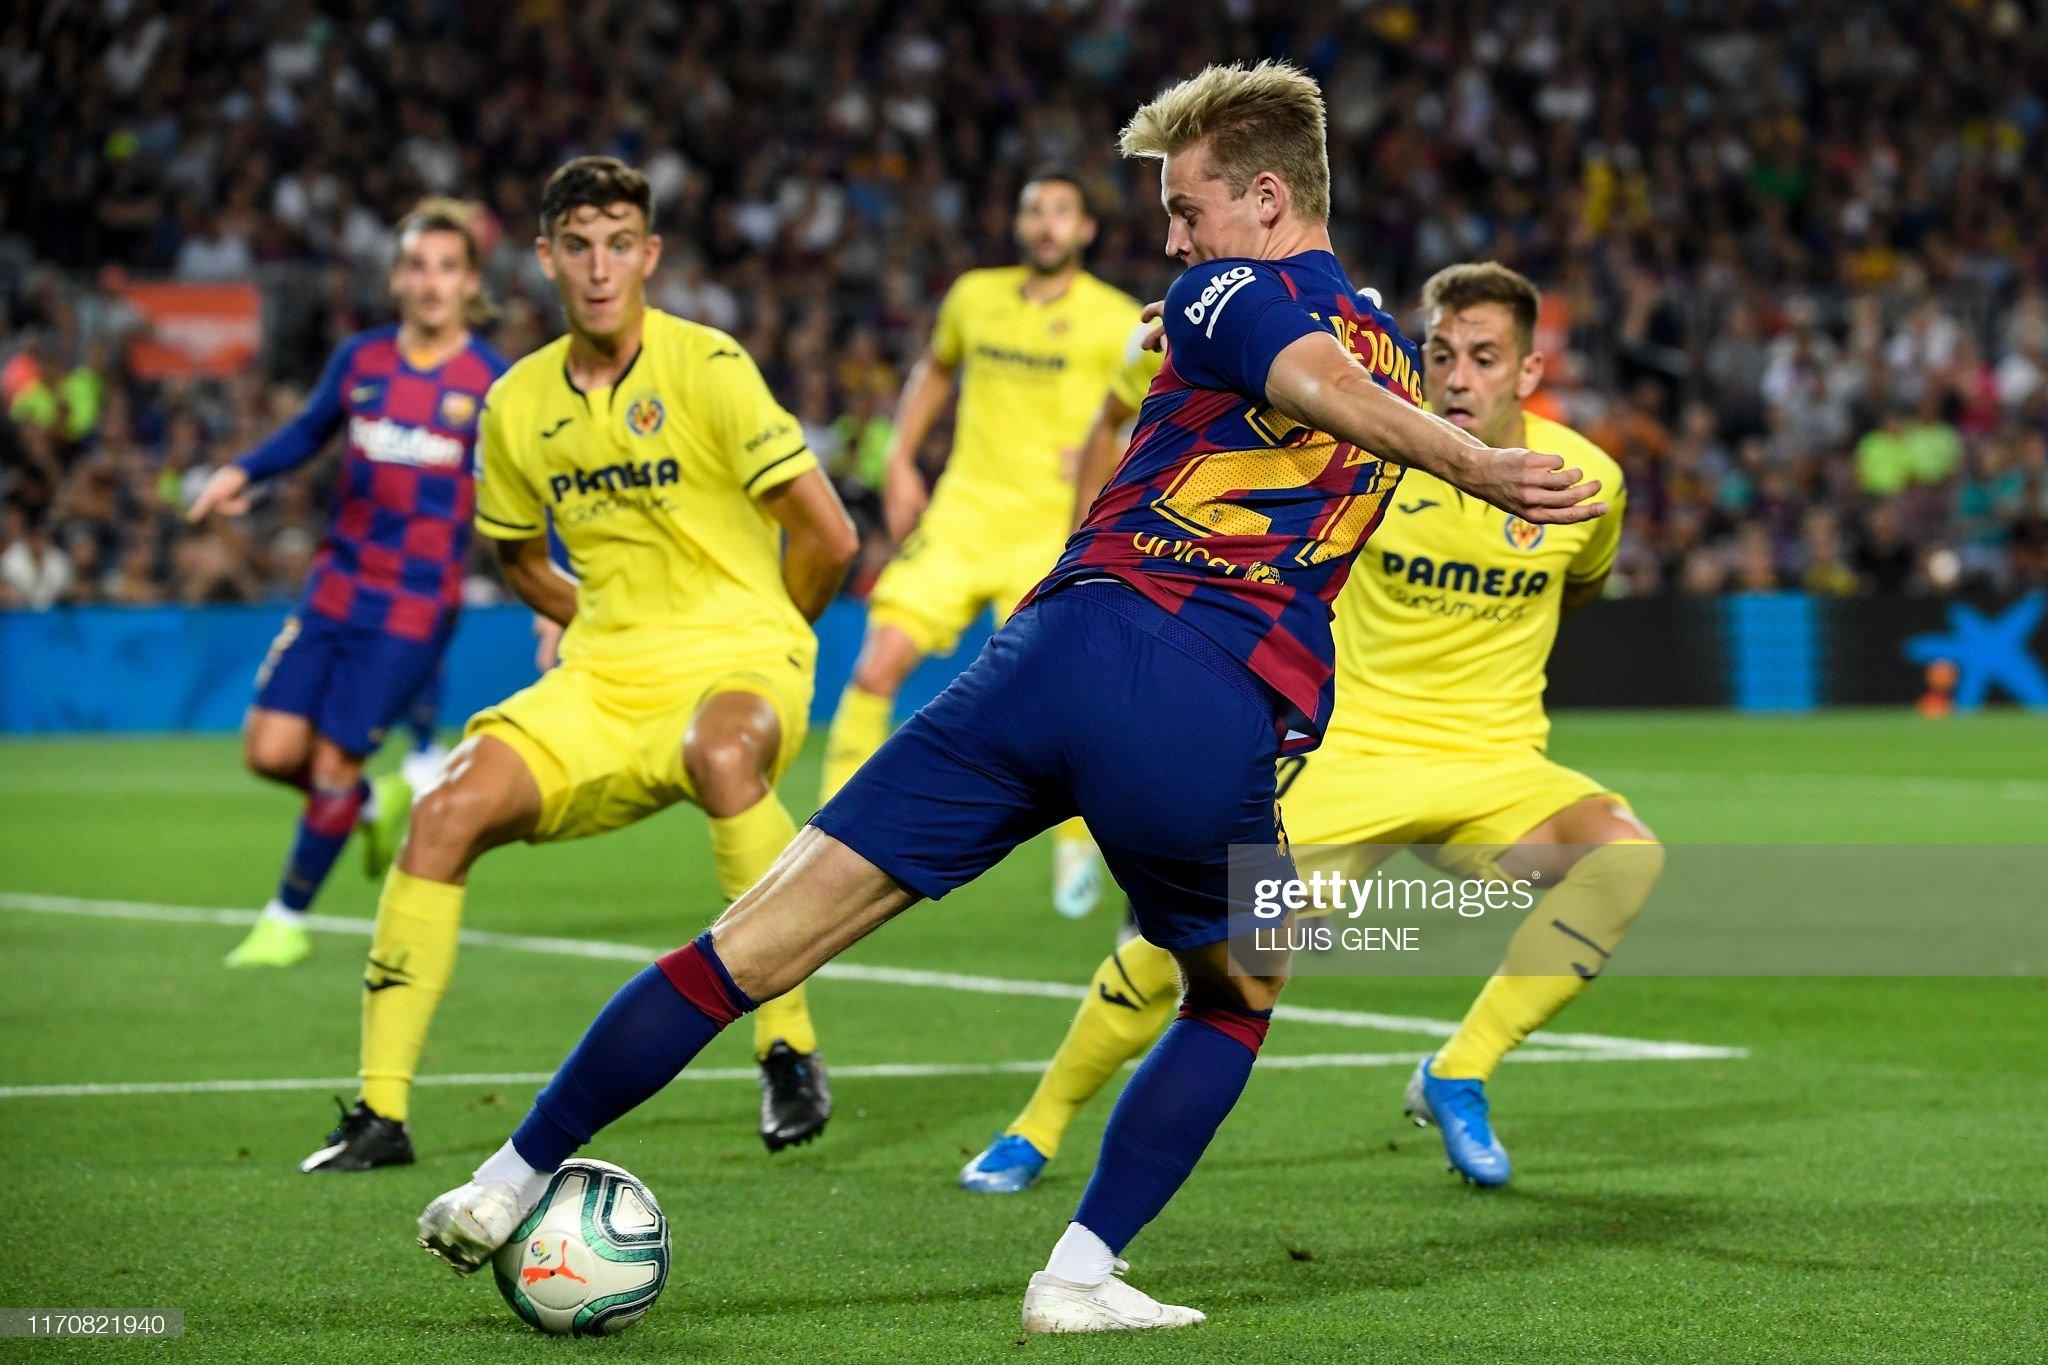 صور مباراة : برشلونة - فياريال 2-1 ( 24-09-2019 )  Barcelonas-dutch-midfielder-frenkie-de-jong-controls-the-ball-during-picture-id1170821940?s=2048x2048